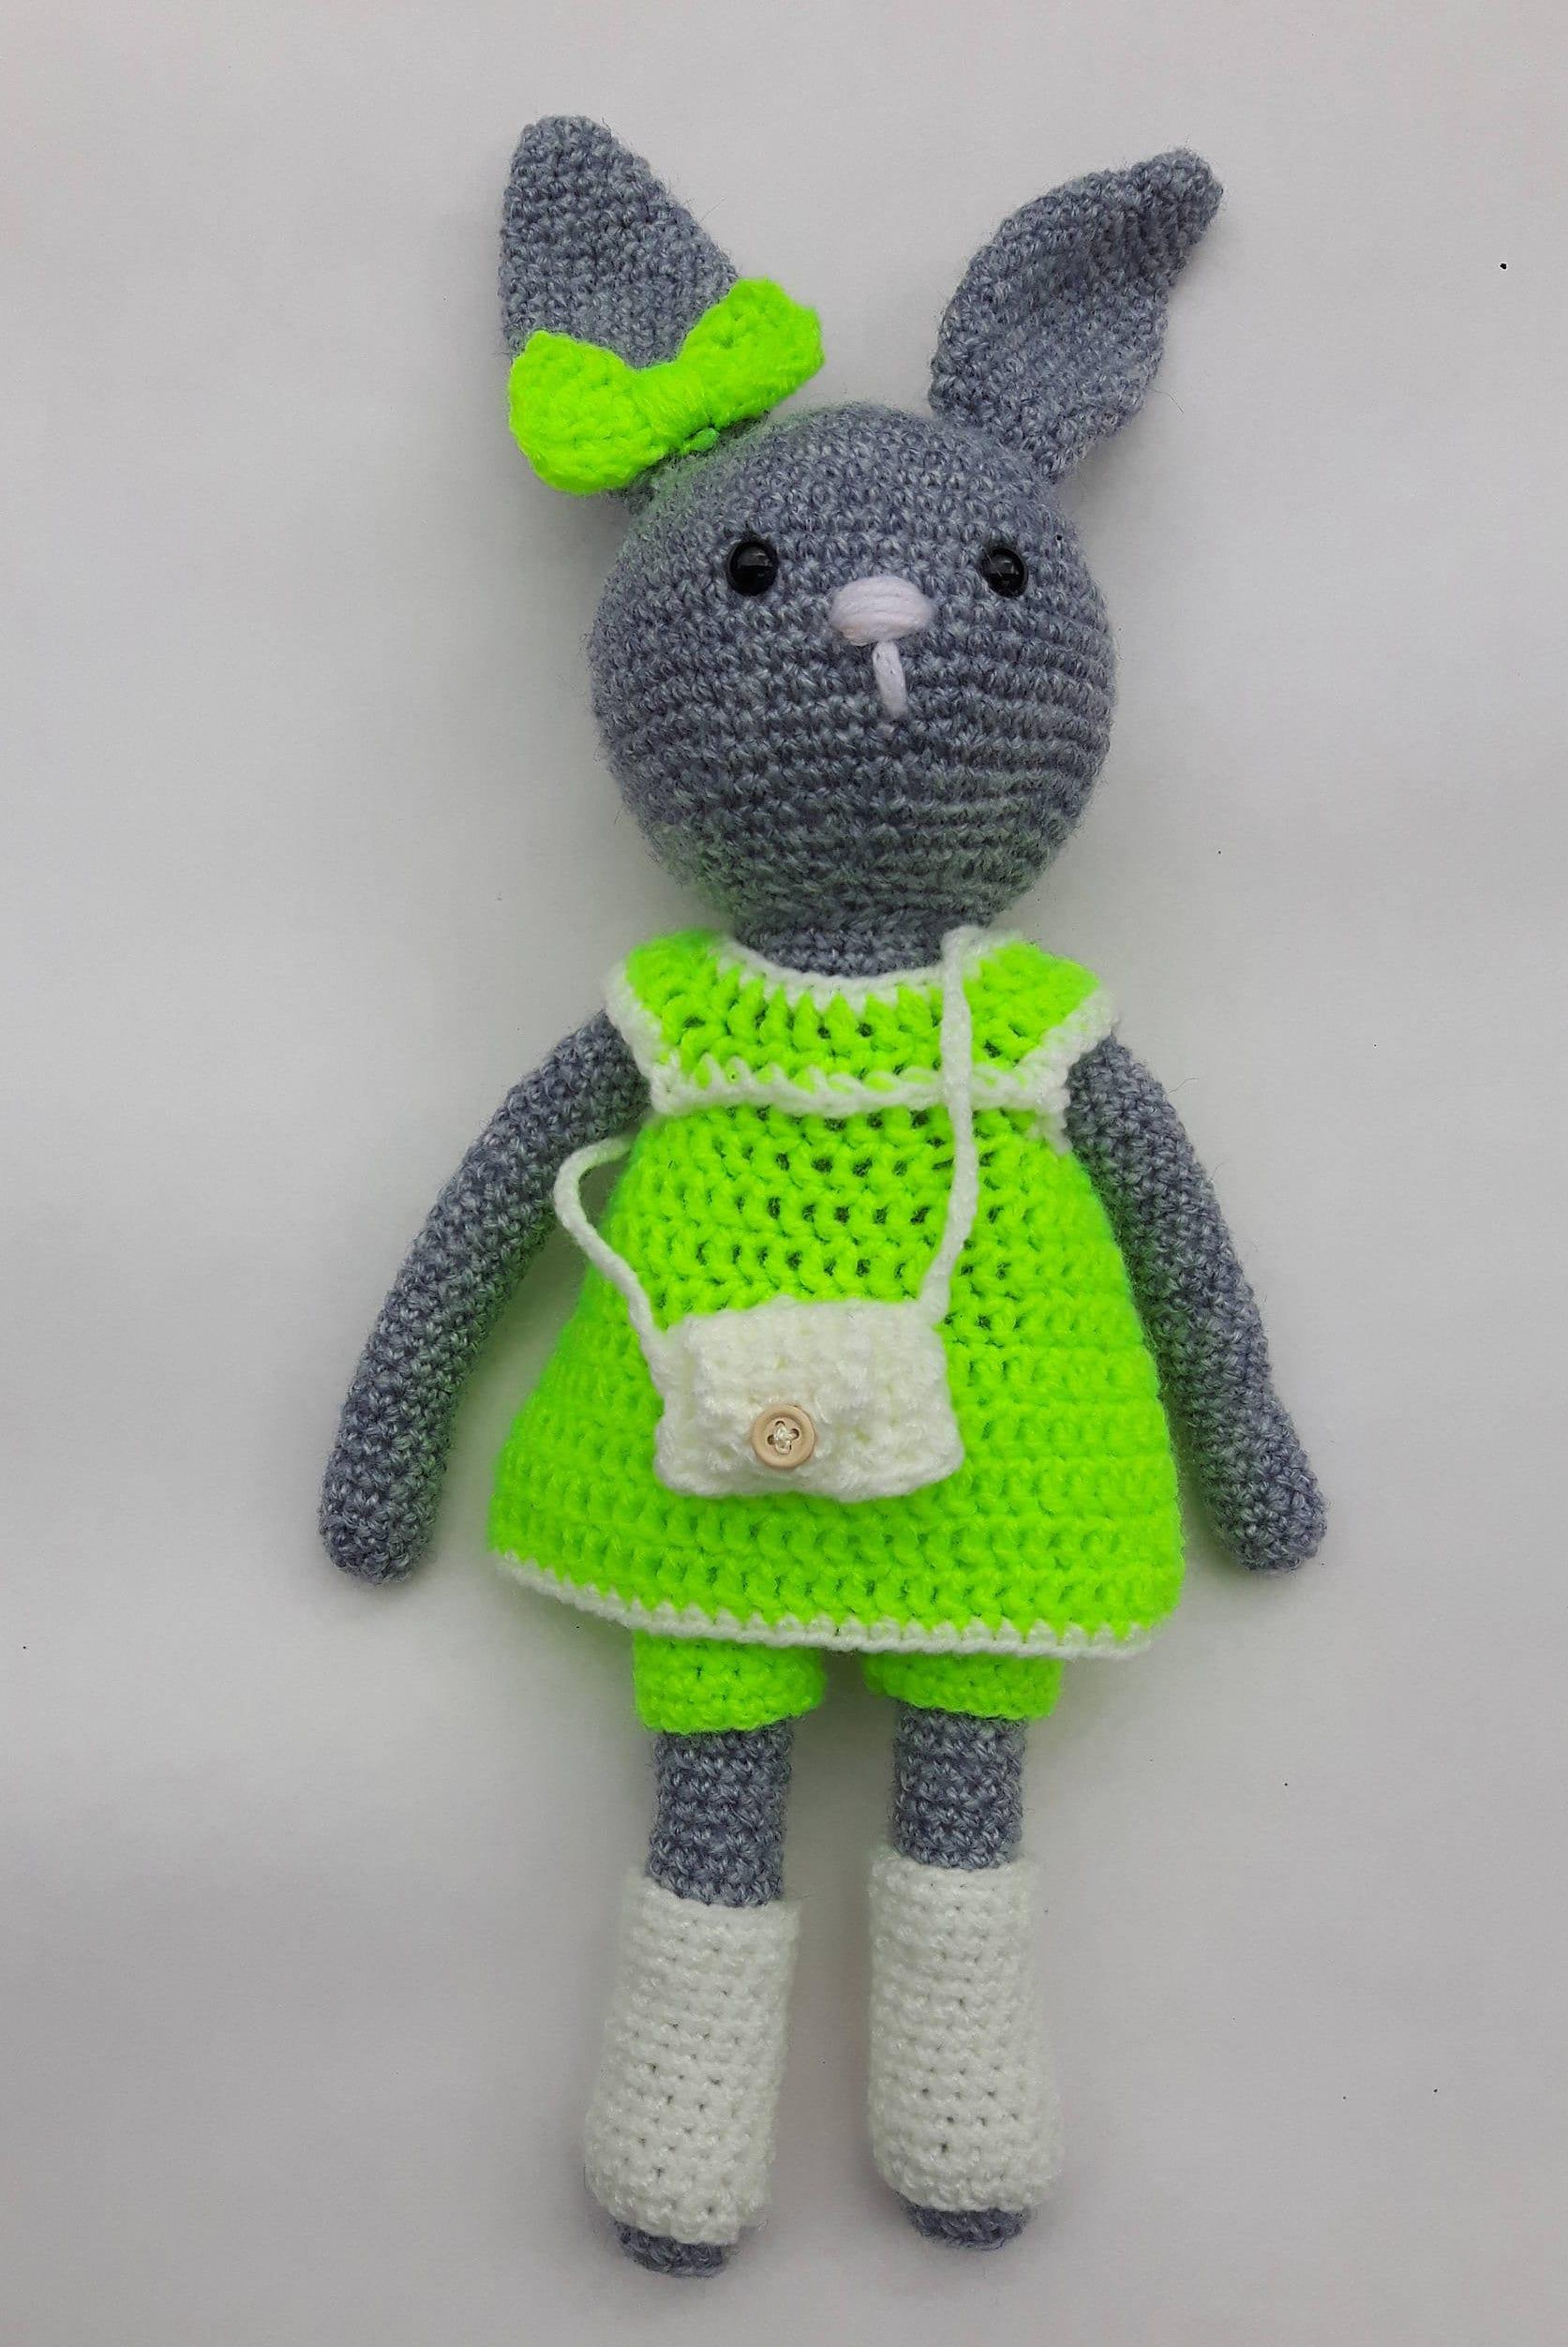 Amigurumi Bunny Crotchet Bunny Stuffed Animal Plushed Toy Stuffed Rabbit Kids ToyUnique Decoration